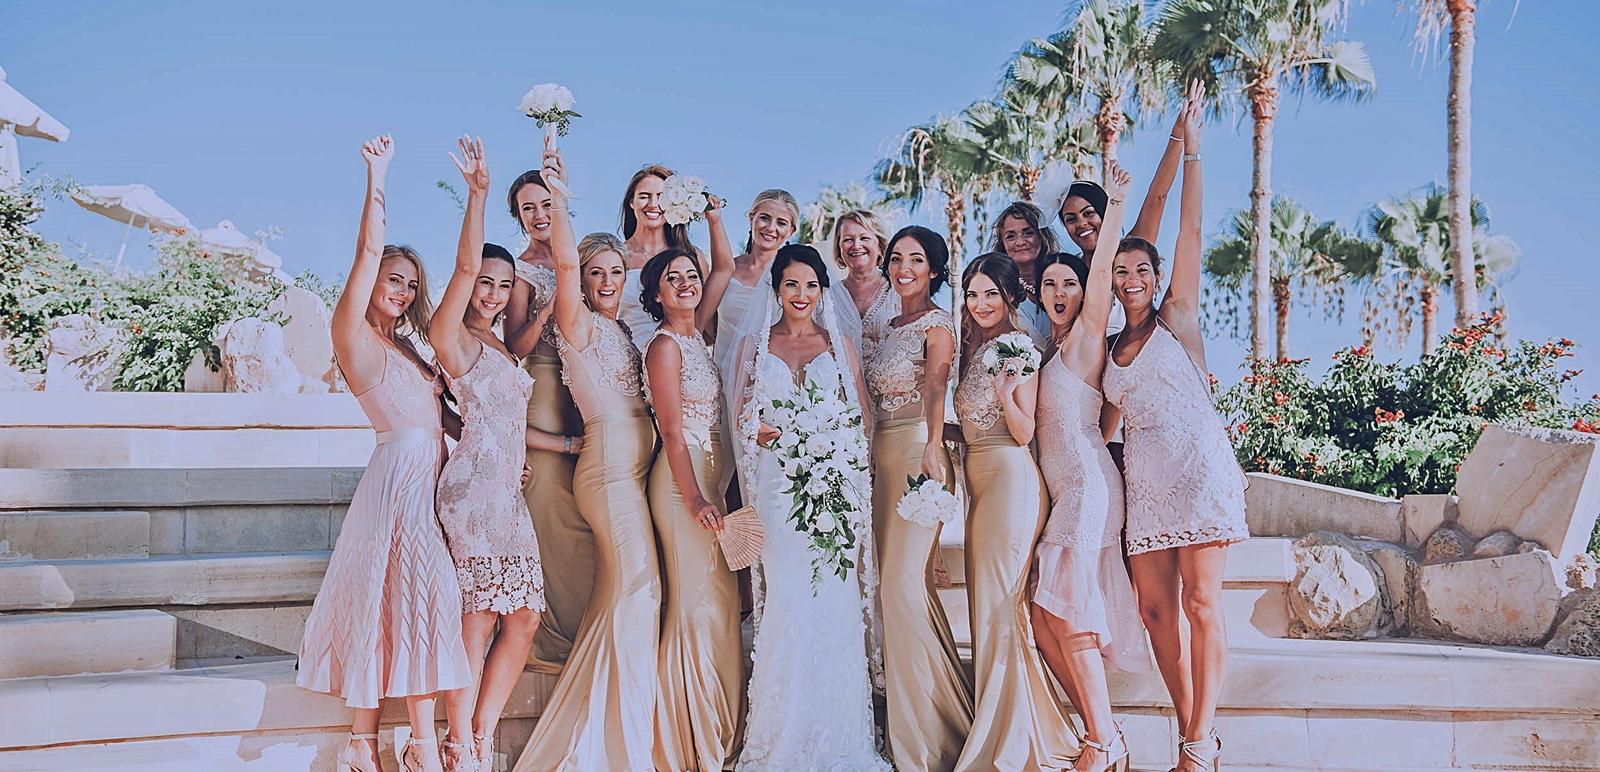 Cyprus wedding planners Paphos (2)